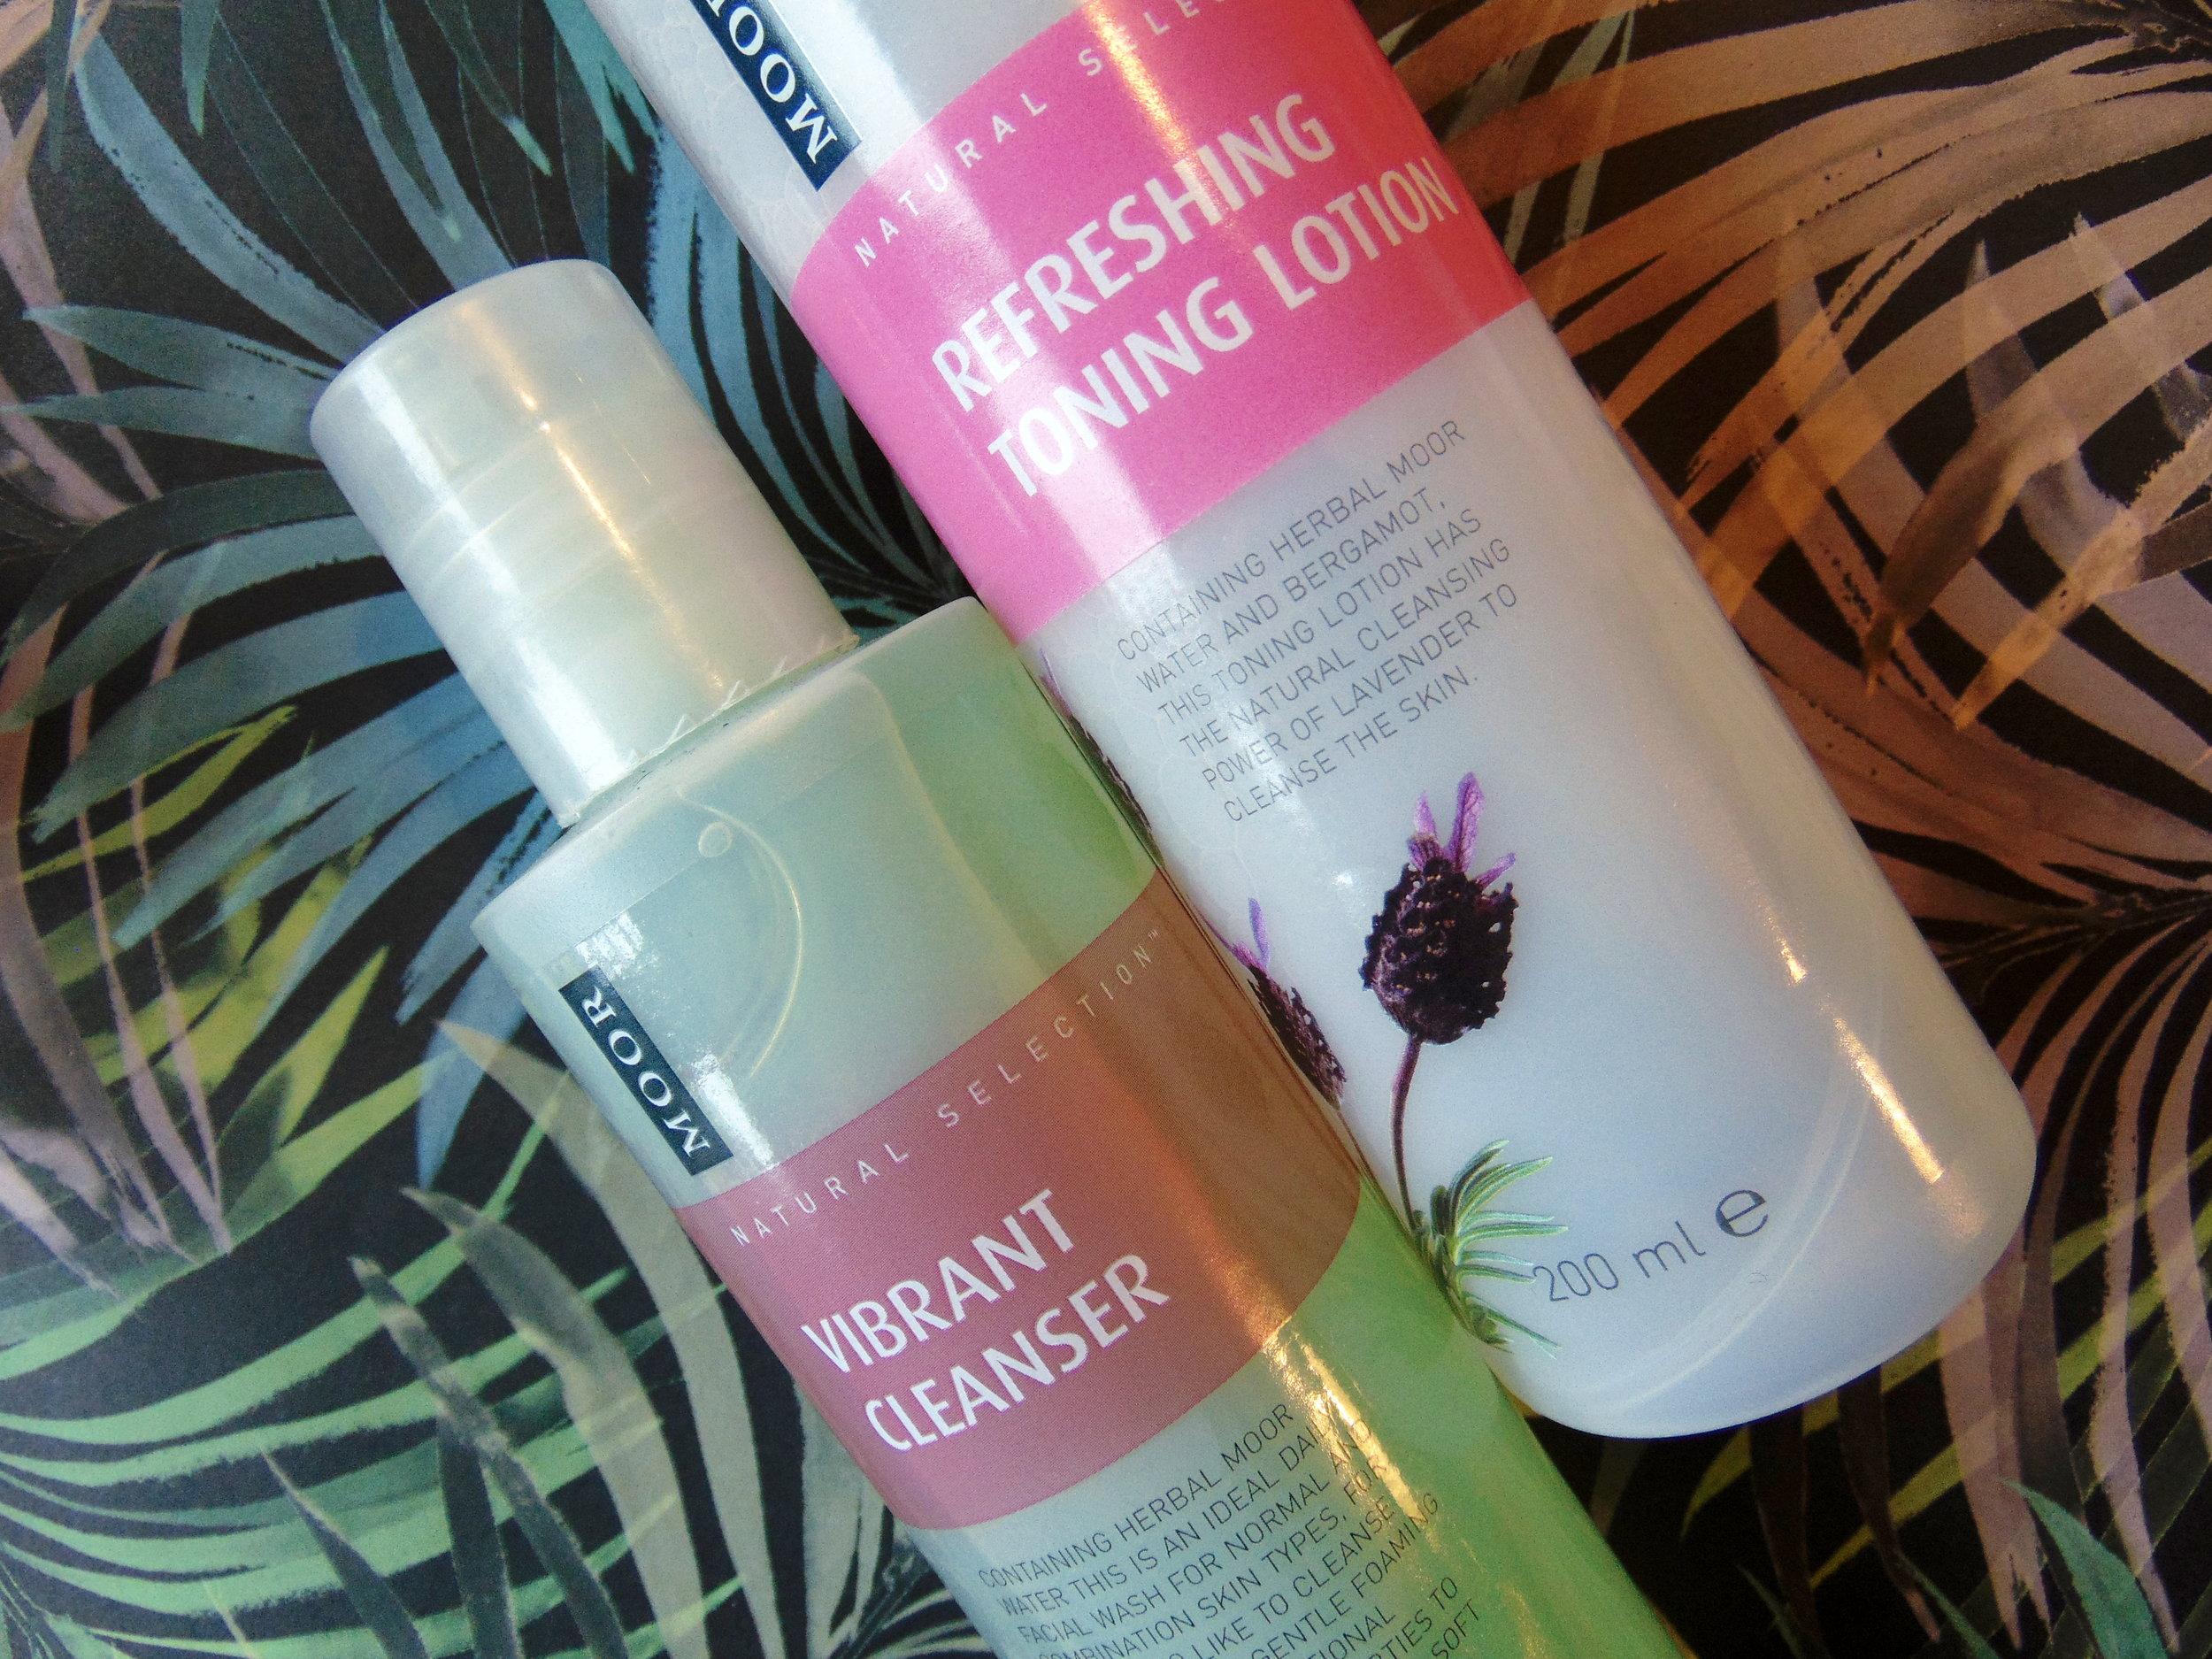 Venus-Beauty-Hair-Tavistock-Devon-Salon-Blog-Top-Tips-Facial-Care-Moor-Spa-Cleanser-Toner.JPG